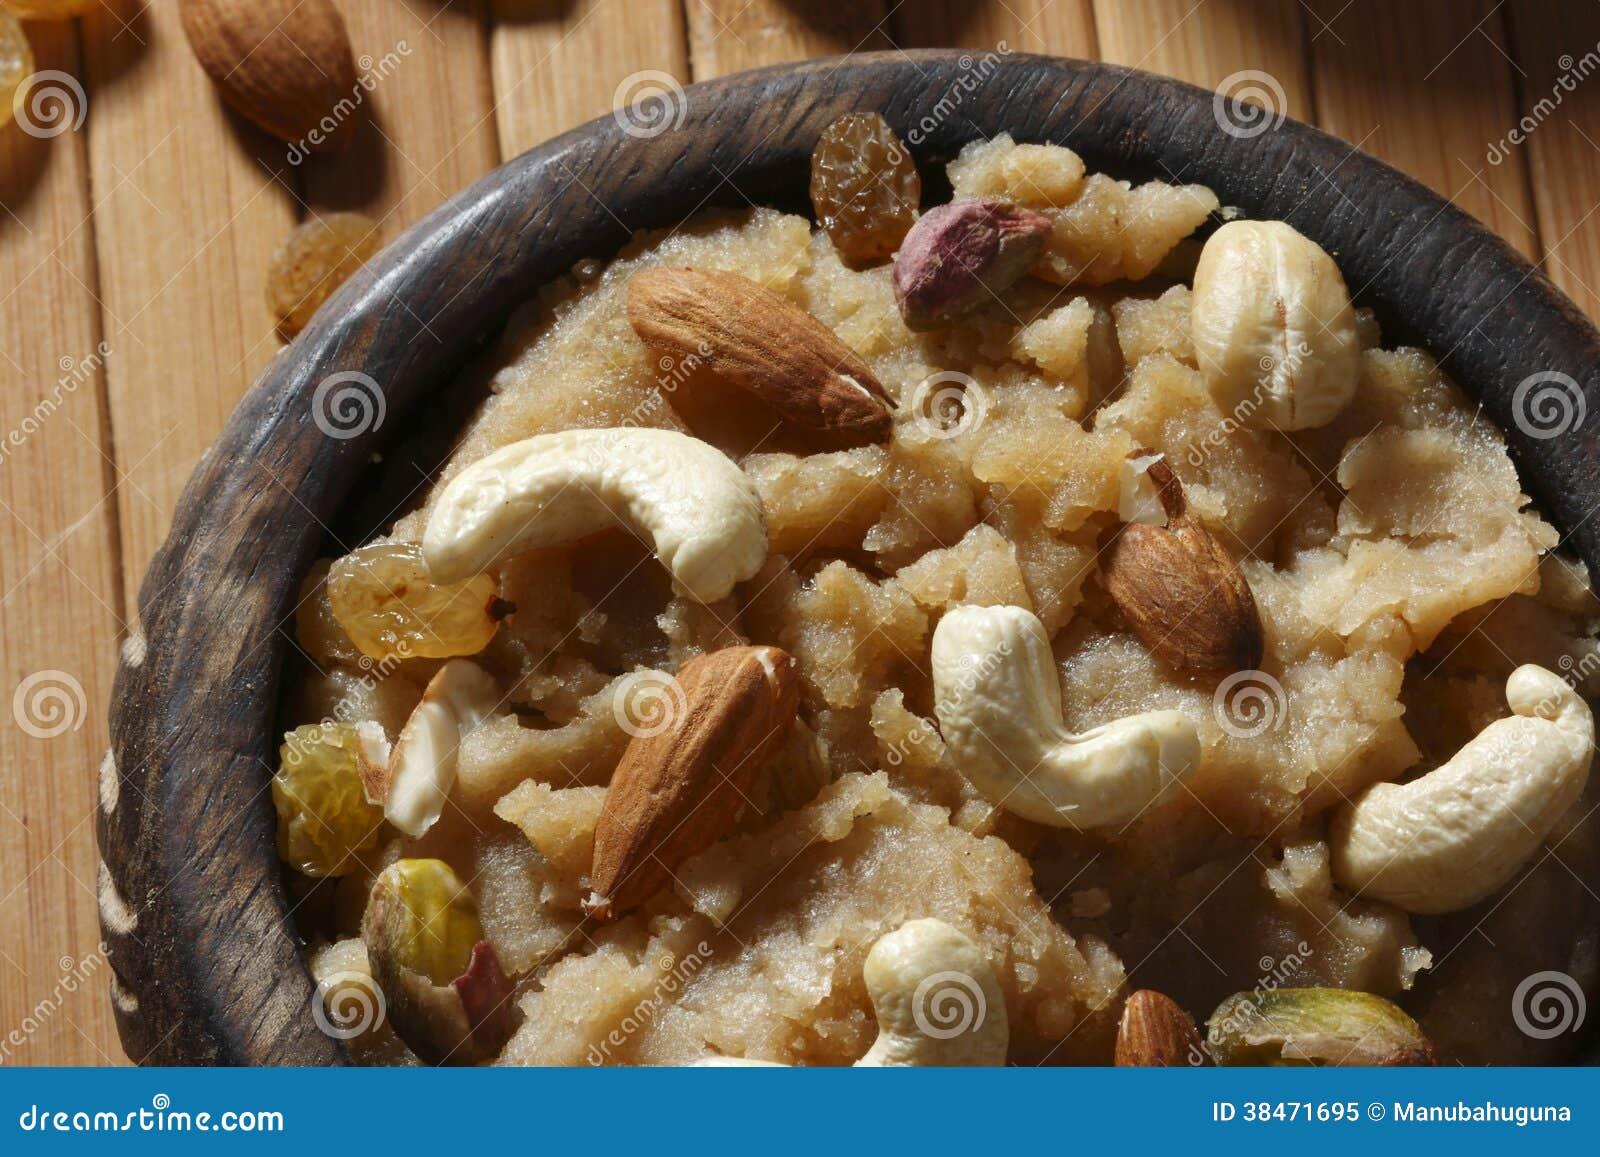 atte ji sero是面粉基于点心做用小麦面粉,酥油和干果子.